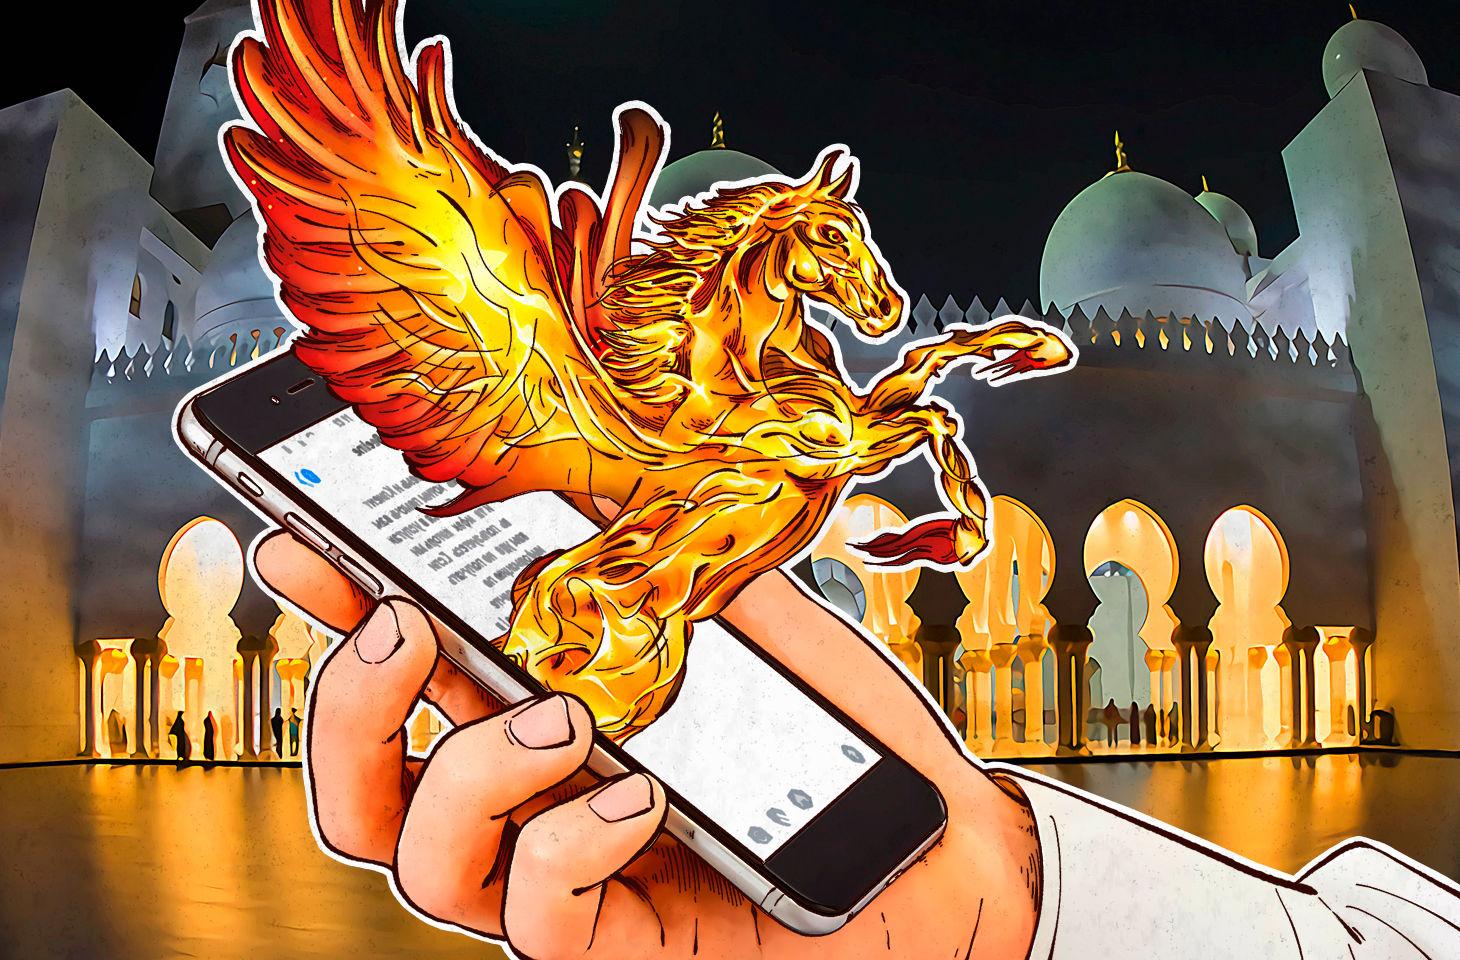 Klassifizierung mobiler Malware, Teil 4